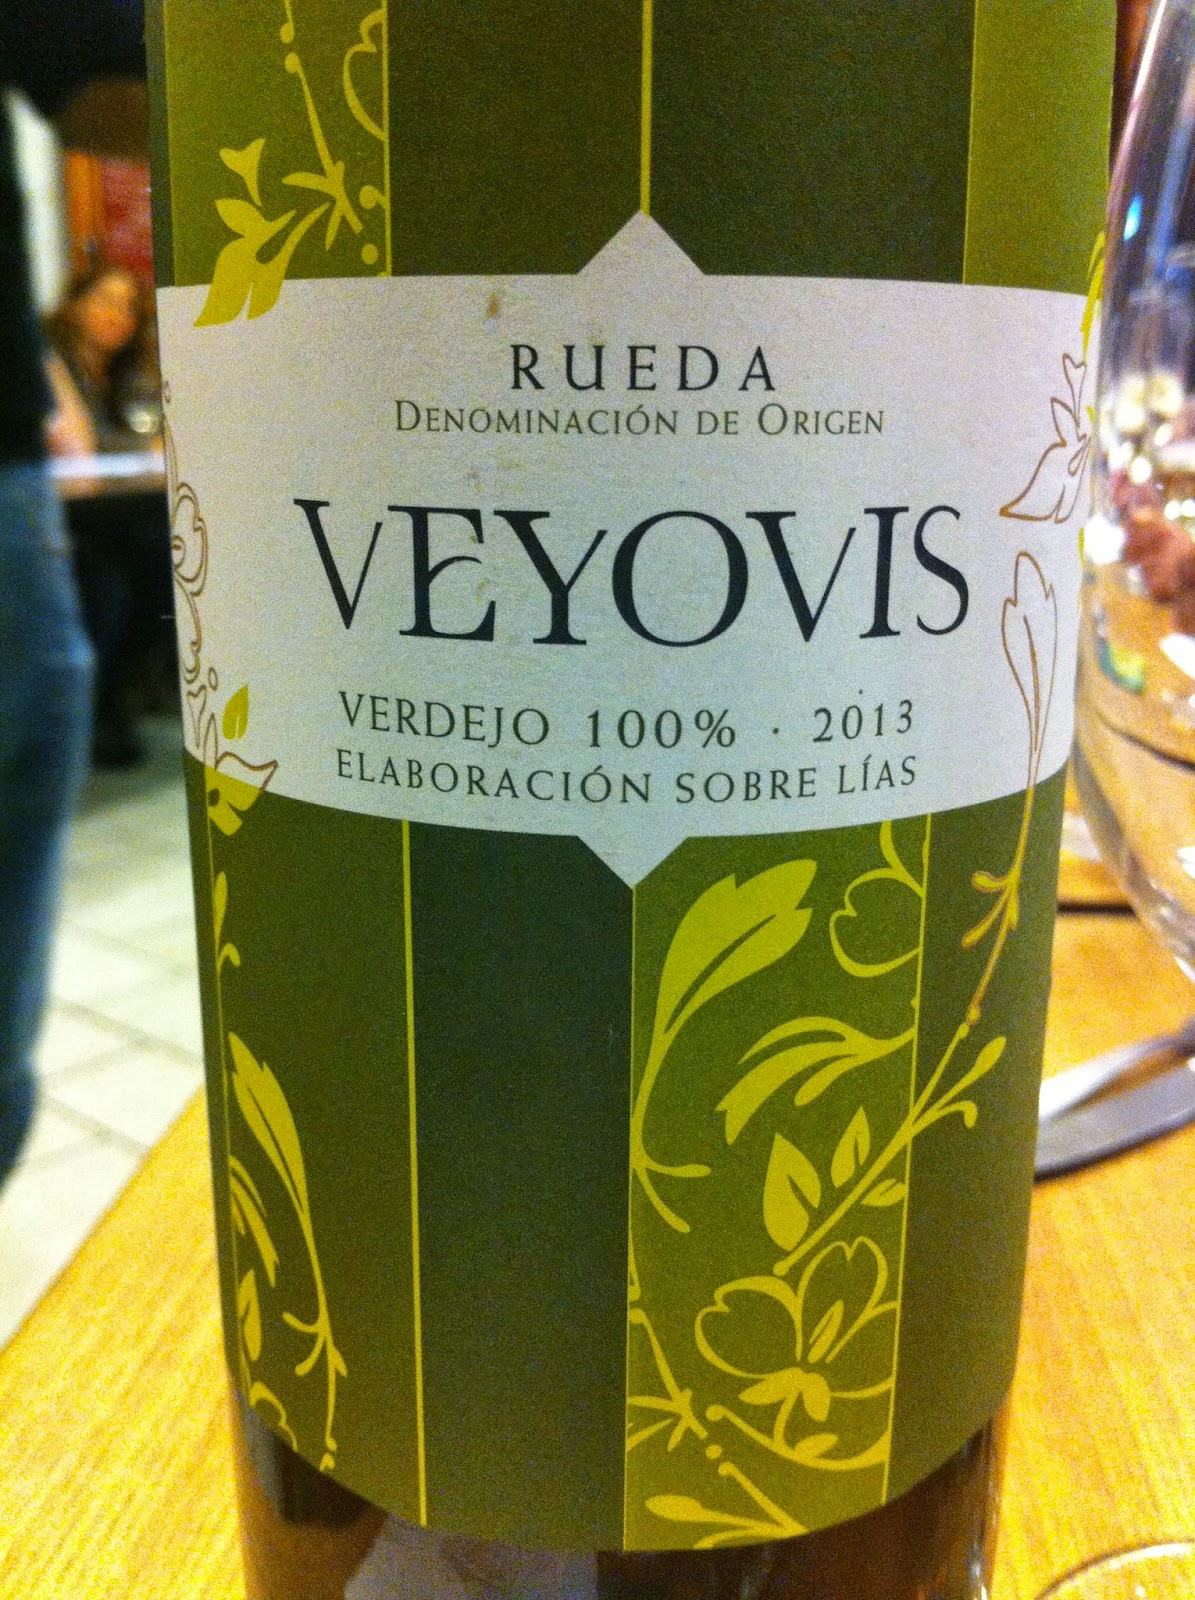 veyovis-verdejo-2013-rueda-blanco